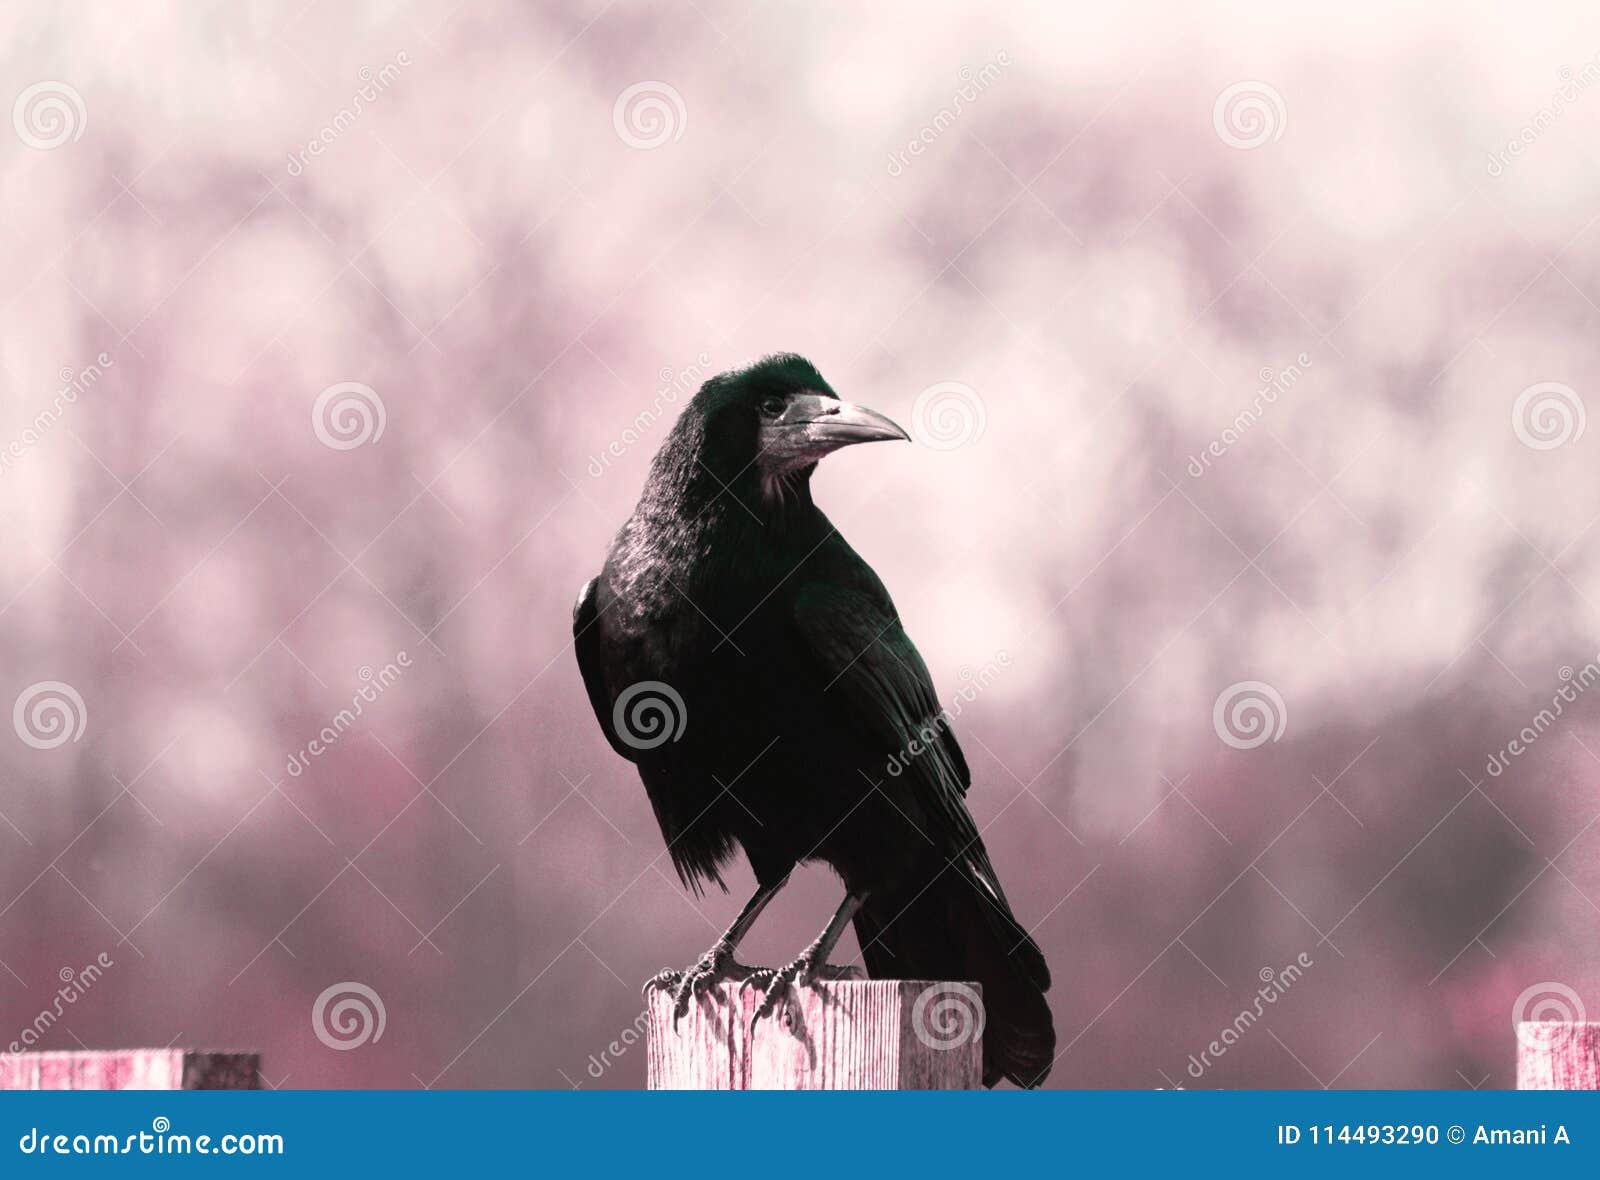 Gawronu, wrony /corvus ptasi frugilegus/